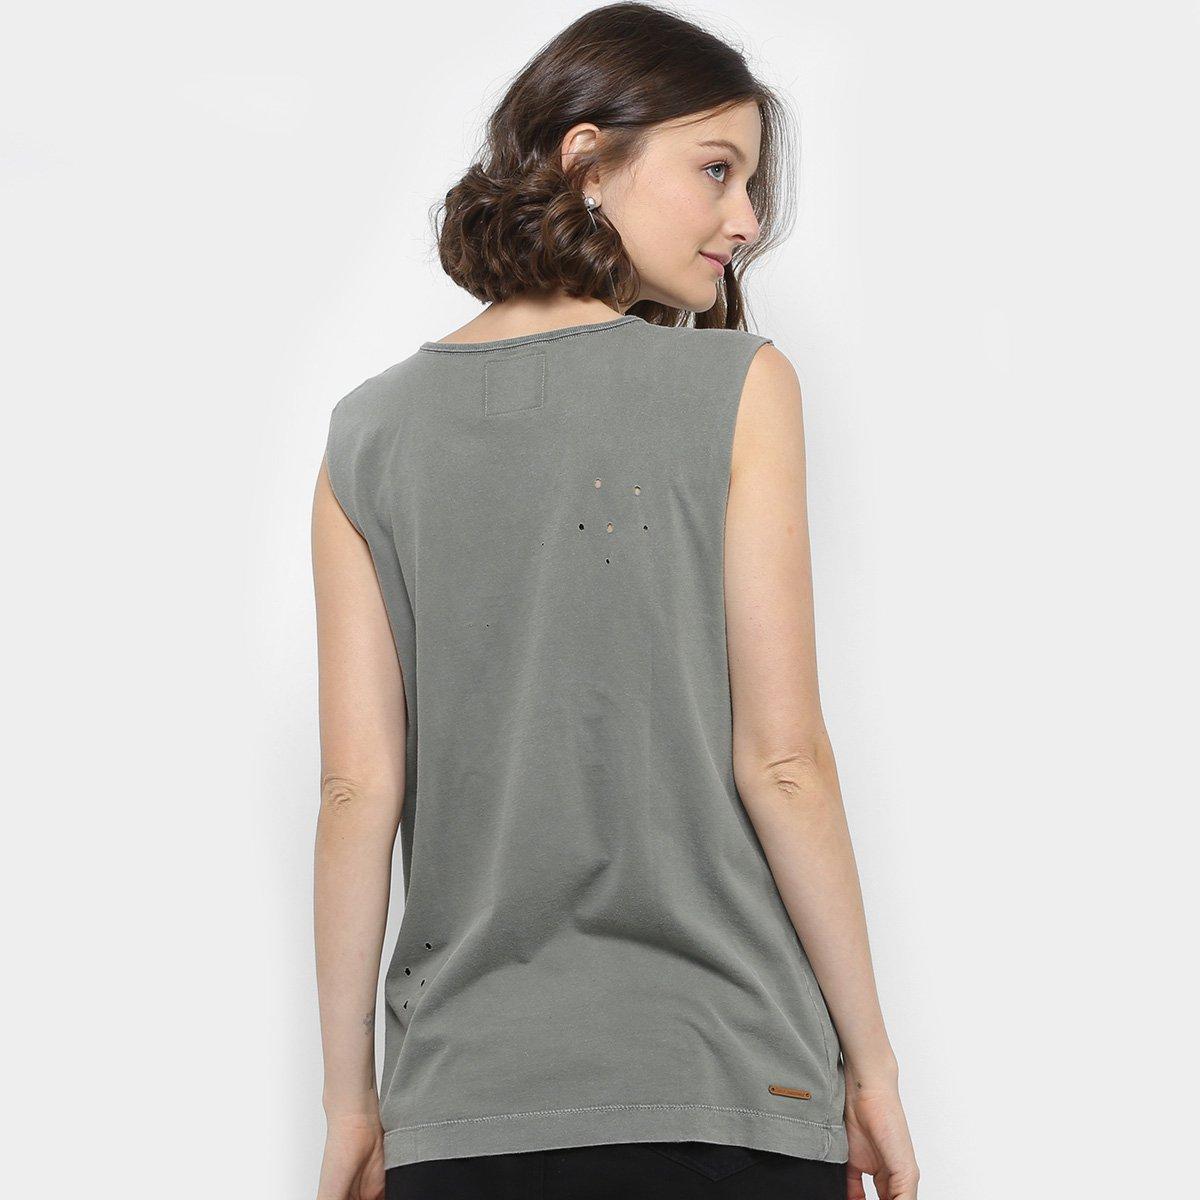 Regata Colcci Silk Caveira Furos Feminina - Compre Agora   Zattini 1ad6ff8d5c